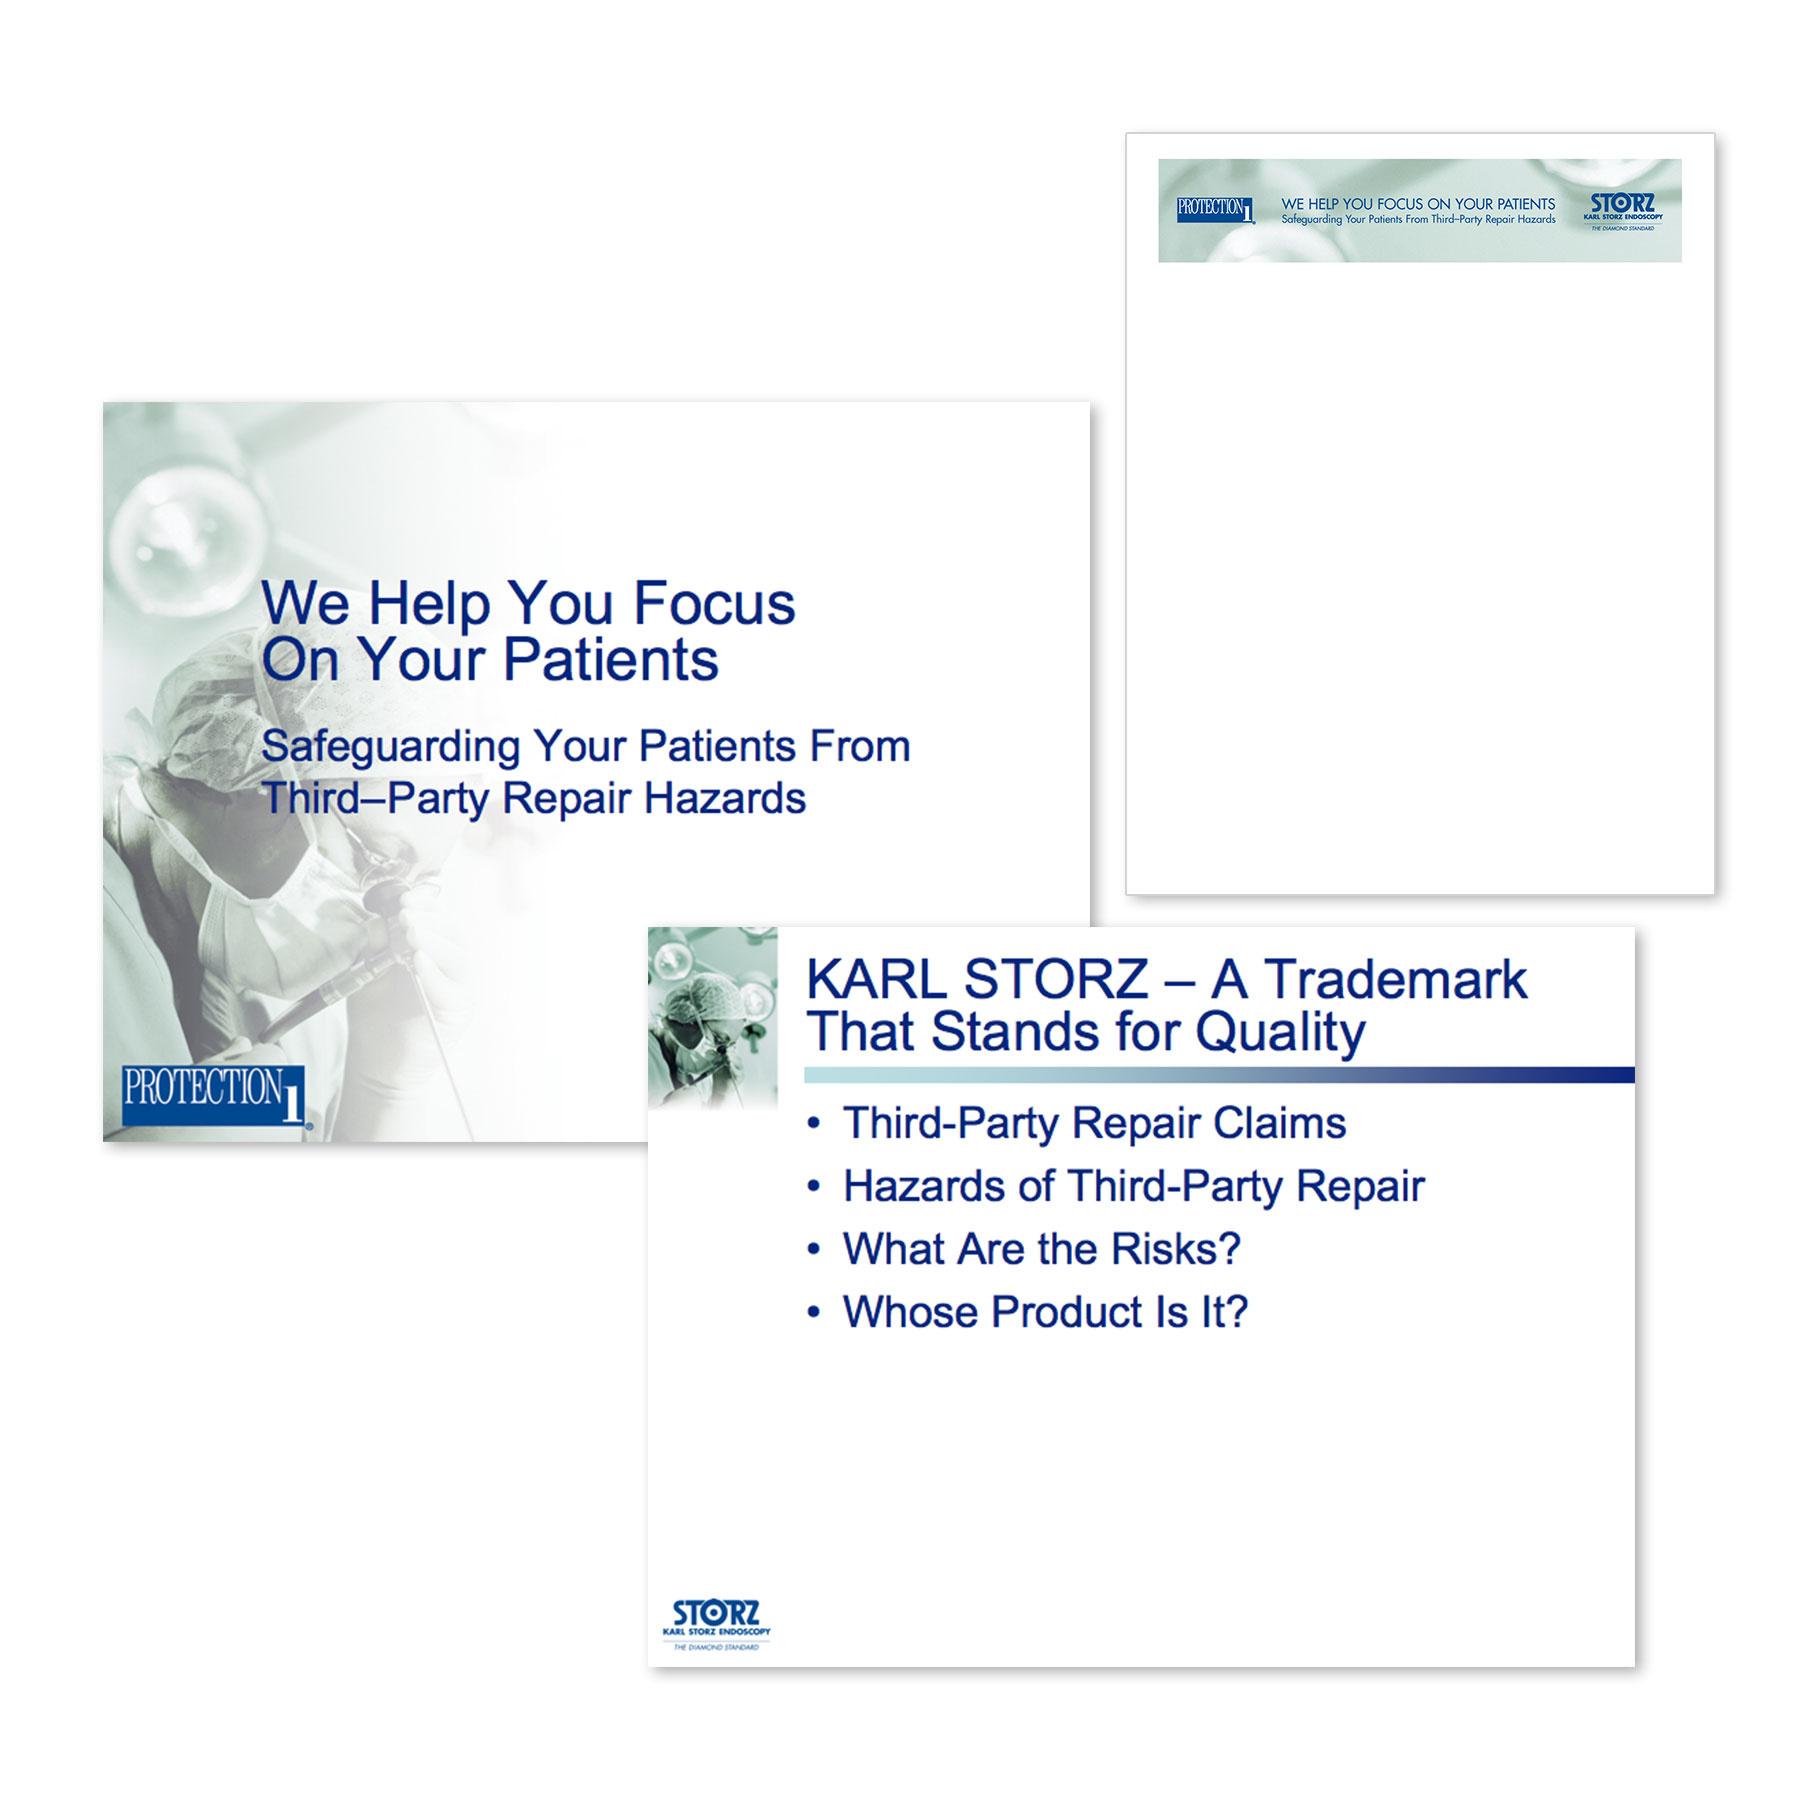 Karl Storz Protection 1 PowerPoint Presentaion & Letterhead